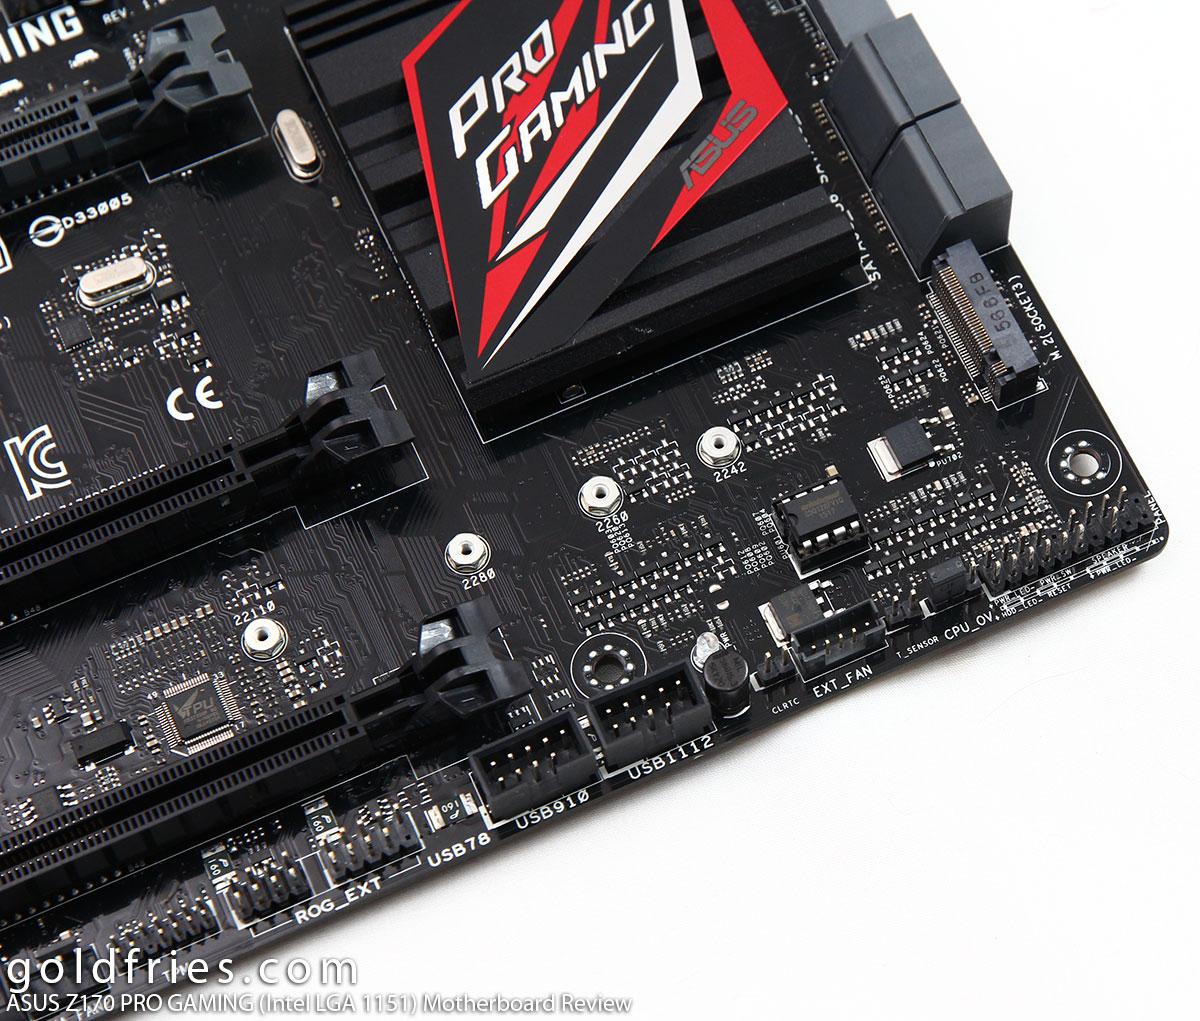 ASUS Z170 PRO GAMING (Intel LGA 1151) Motherboard Review ~ goldfries